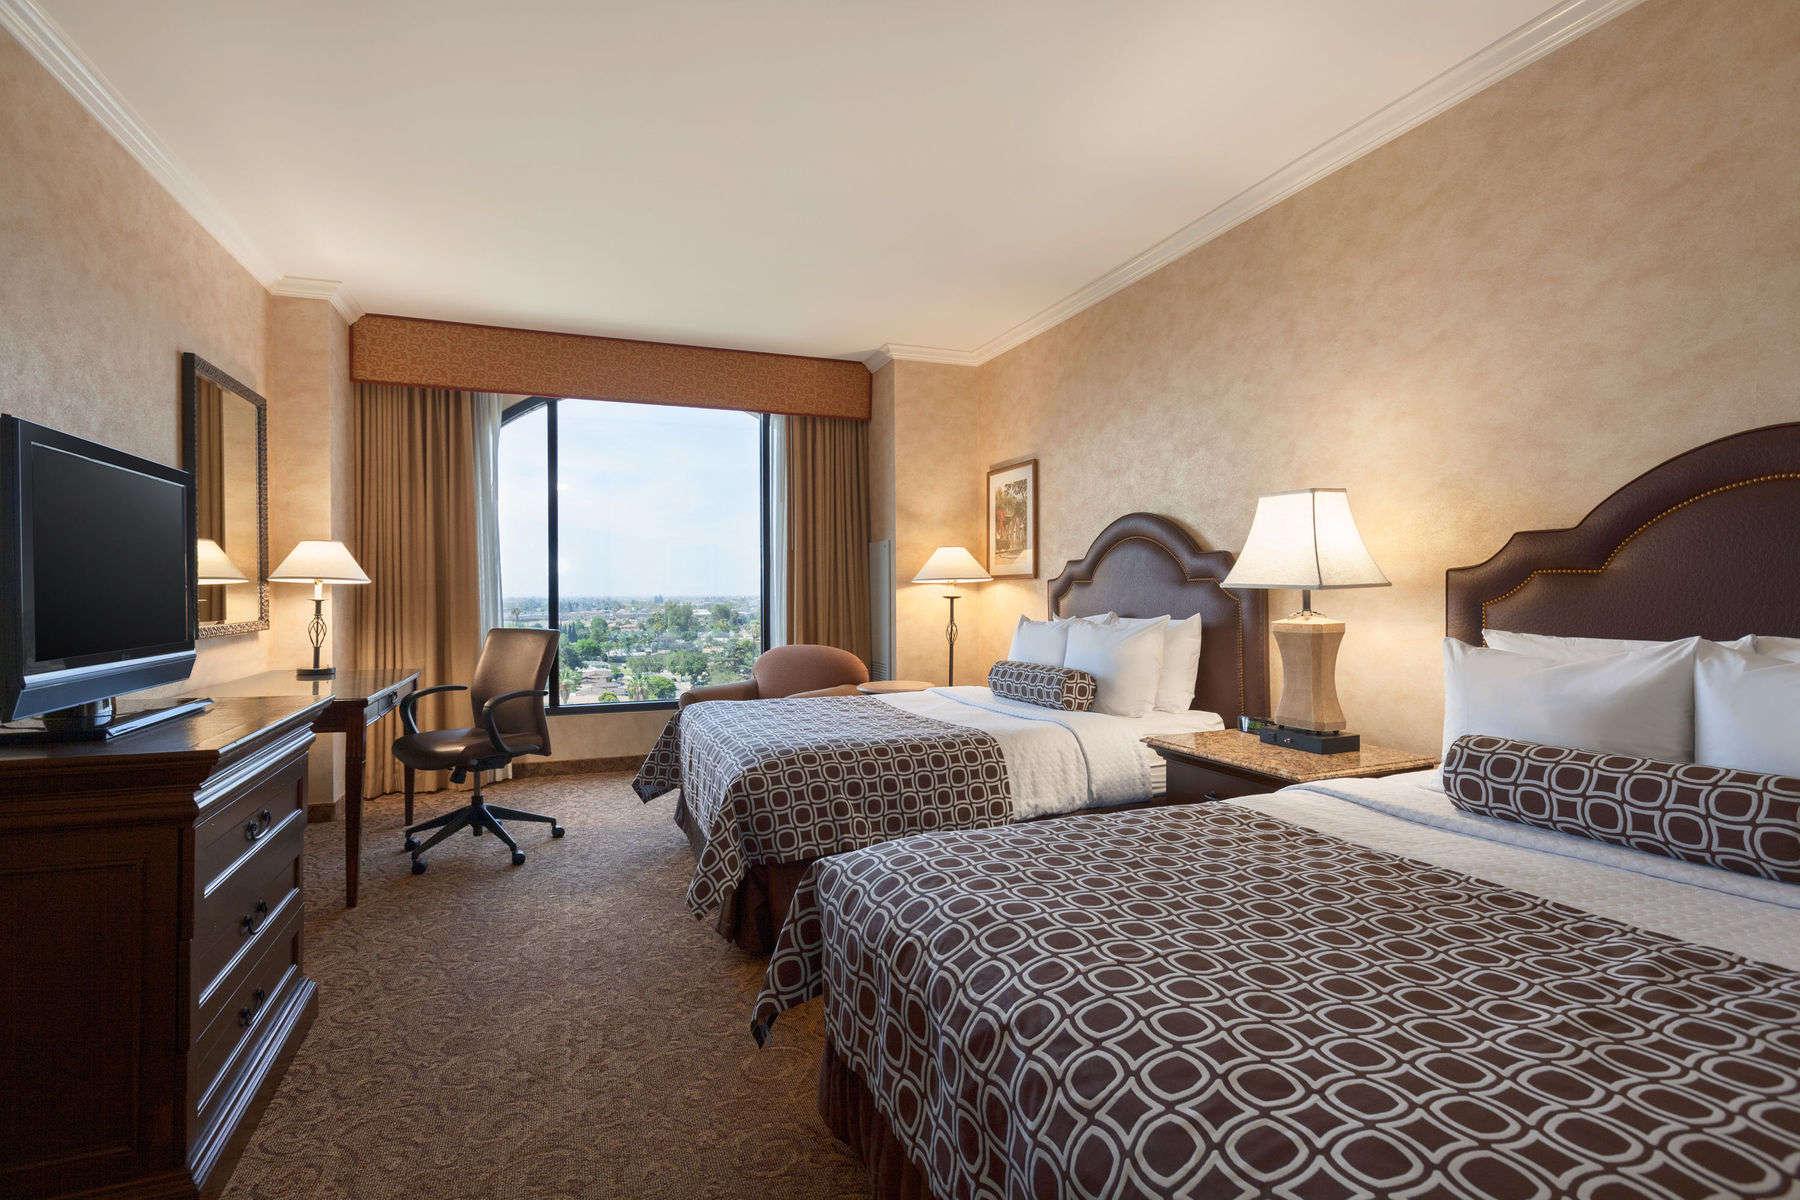 48486_guest_room_4